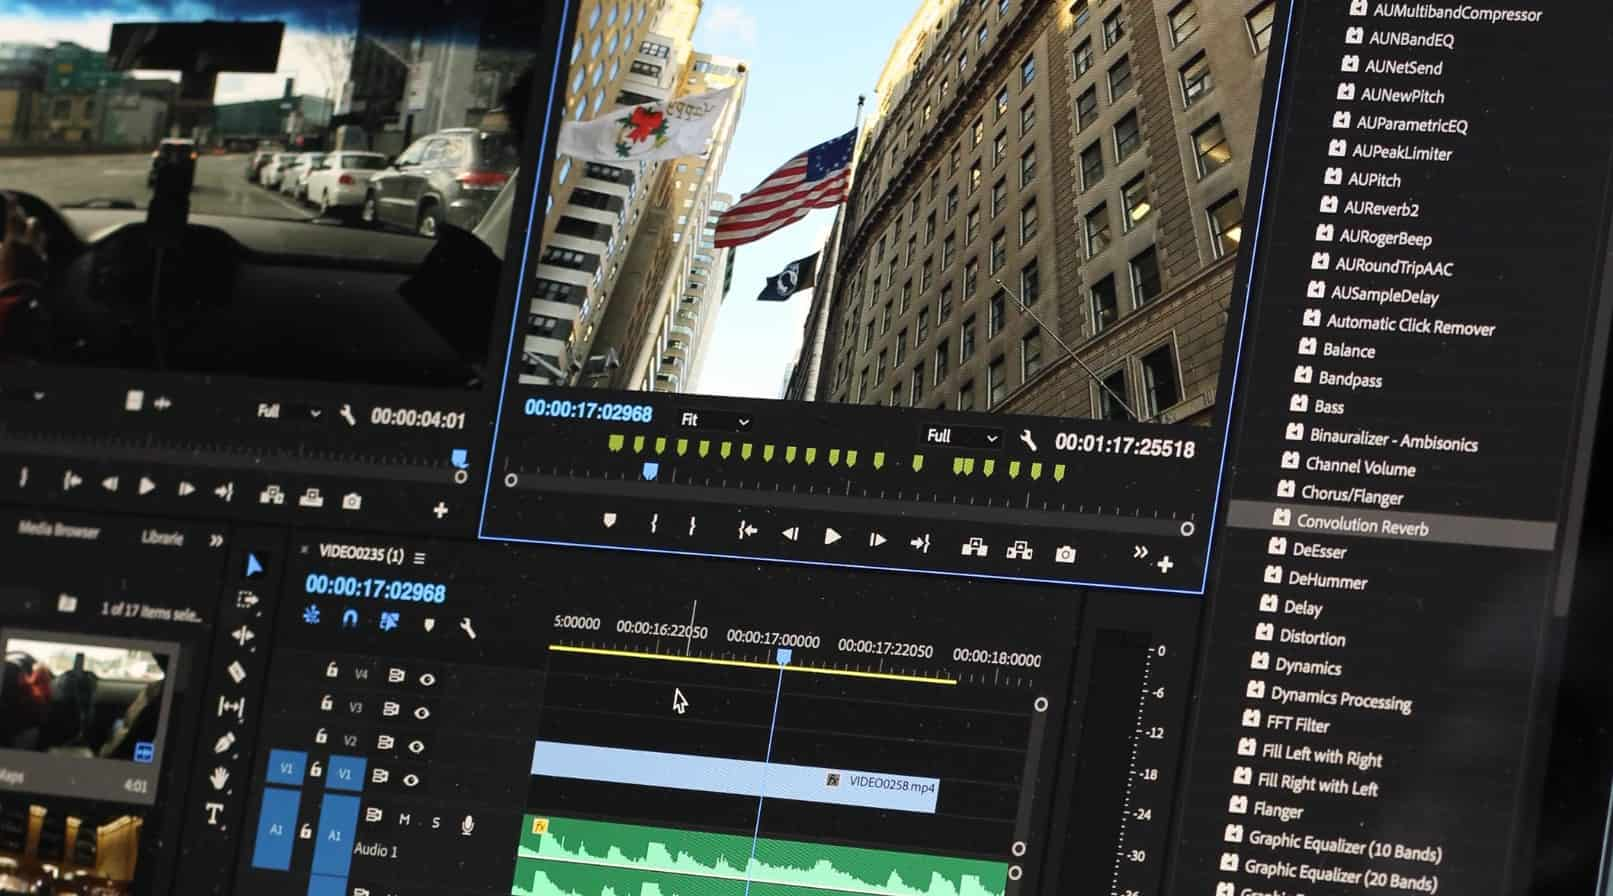 Beste gratis video editor software - title